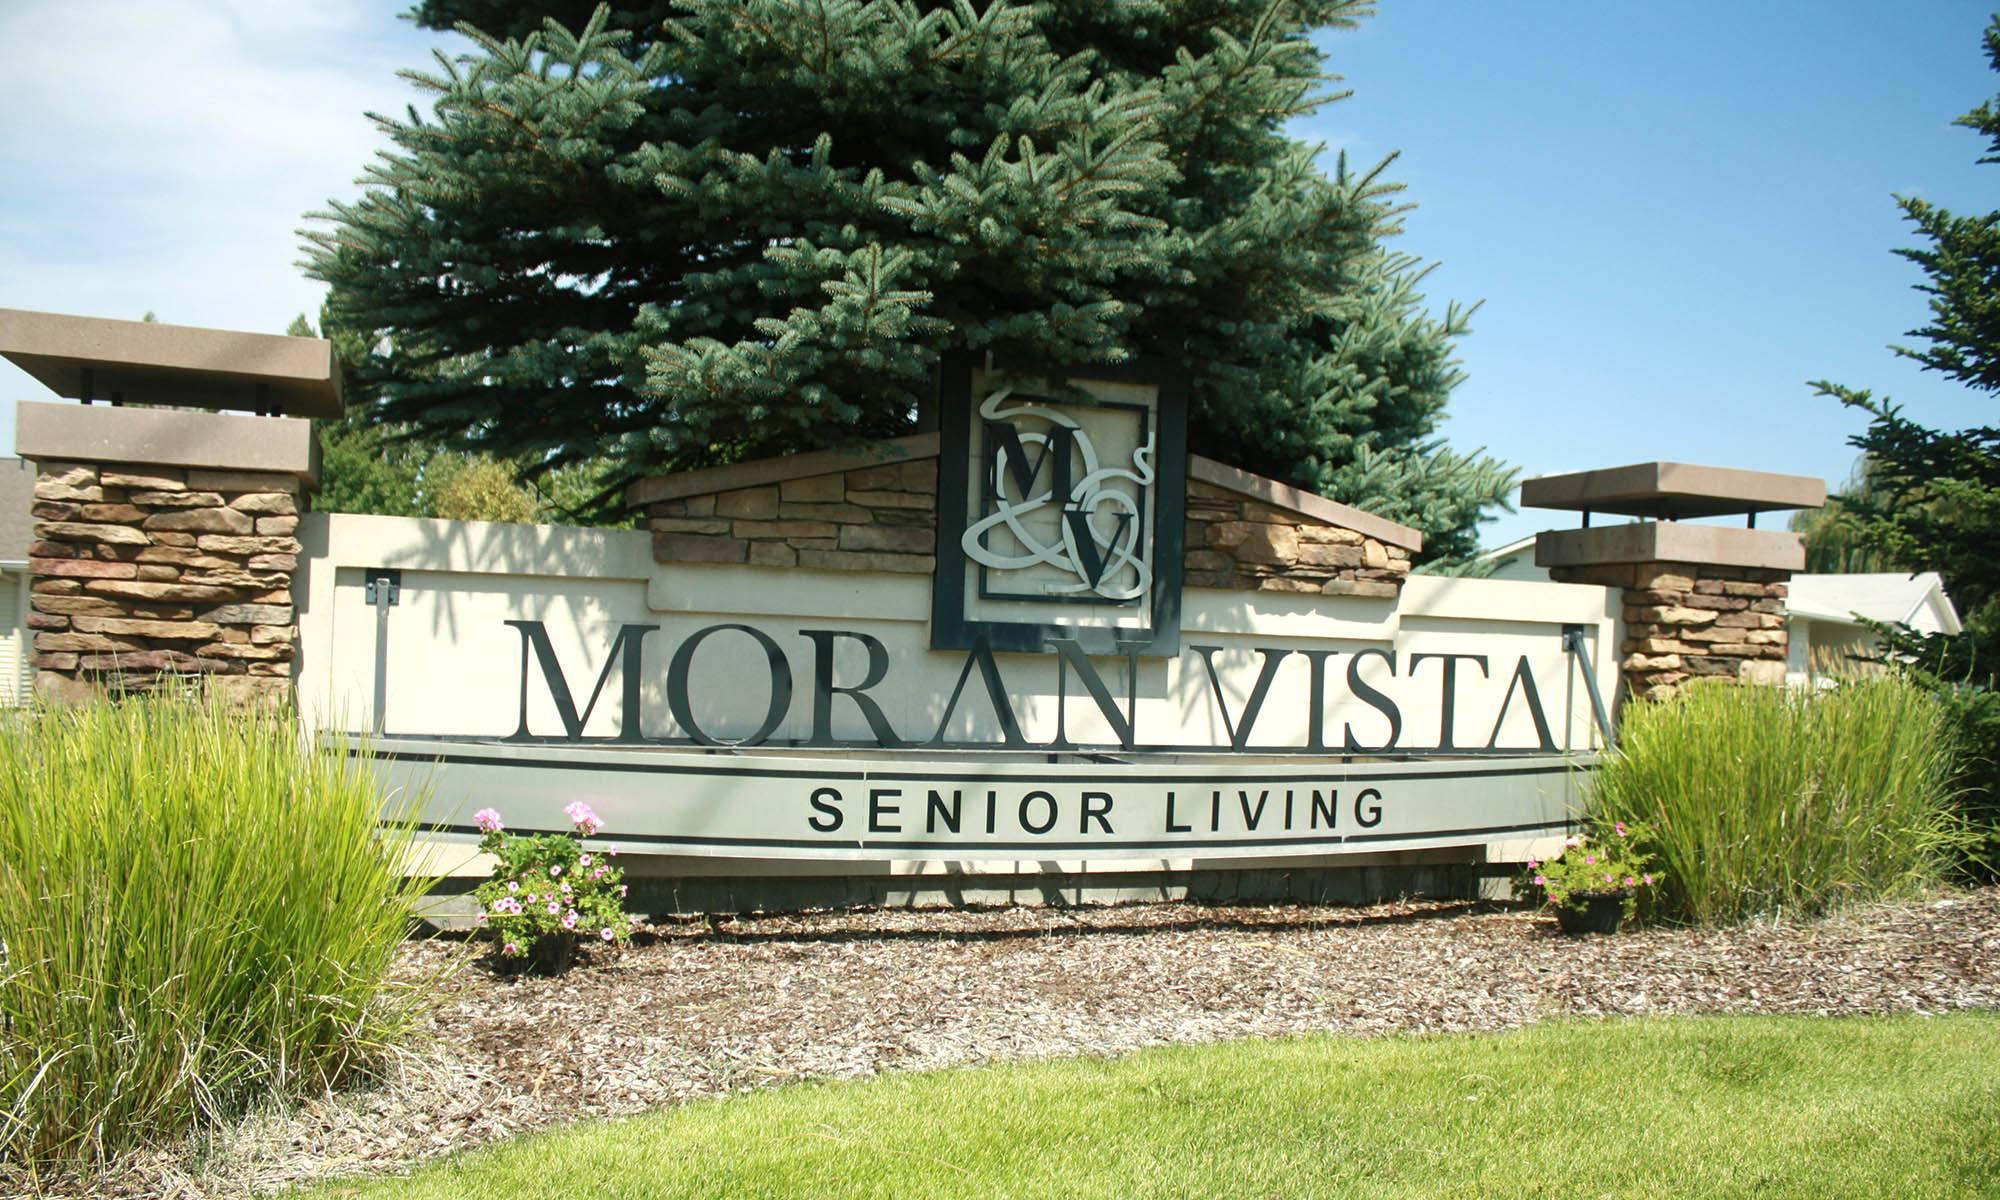 Welcome to Moran Vista in Spokane